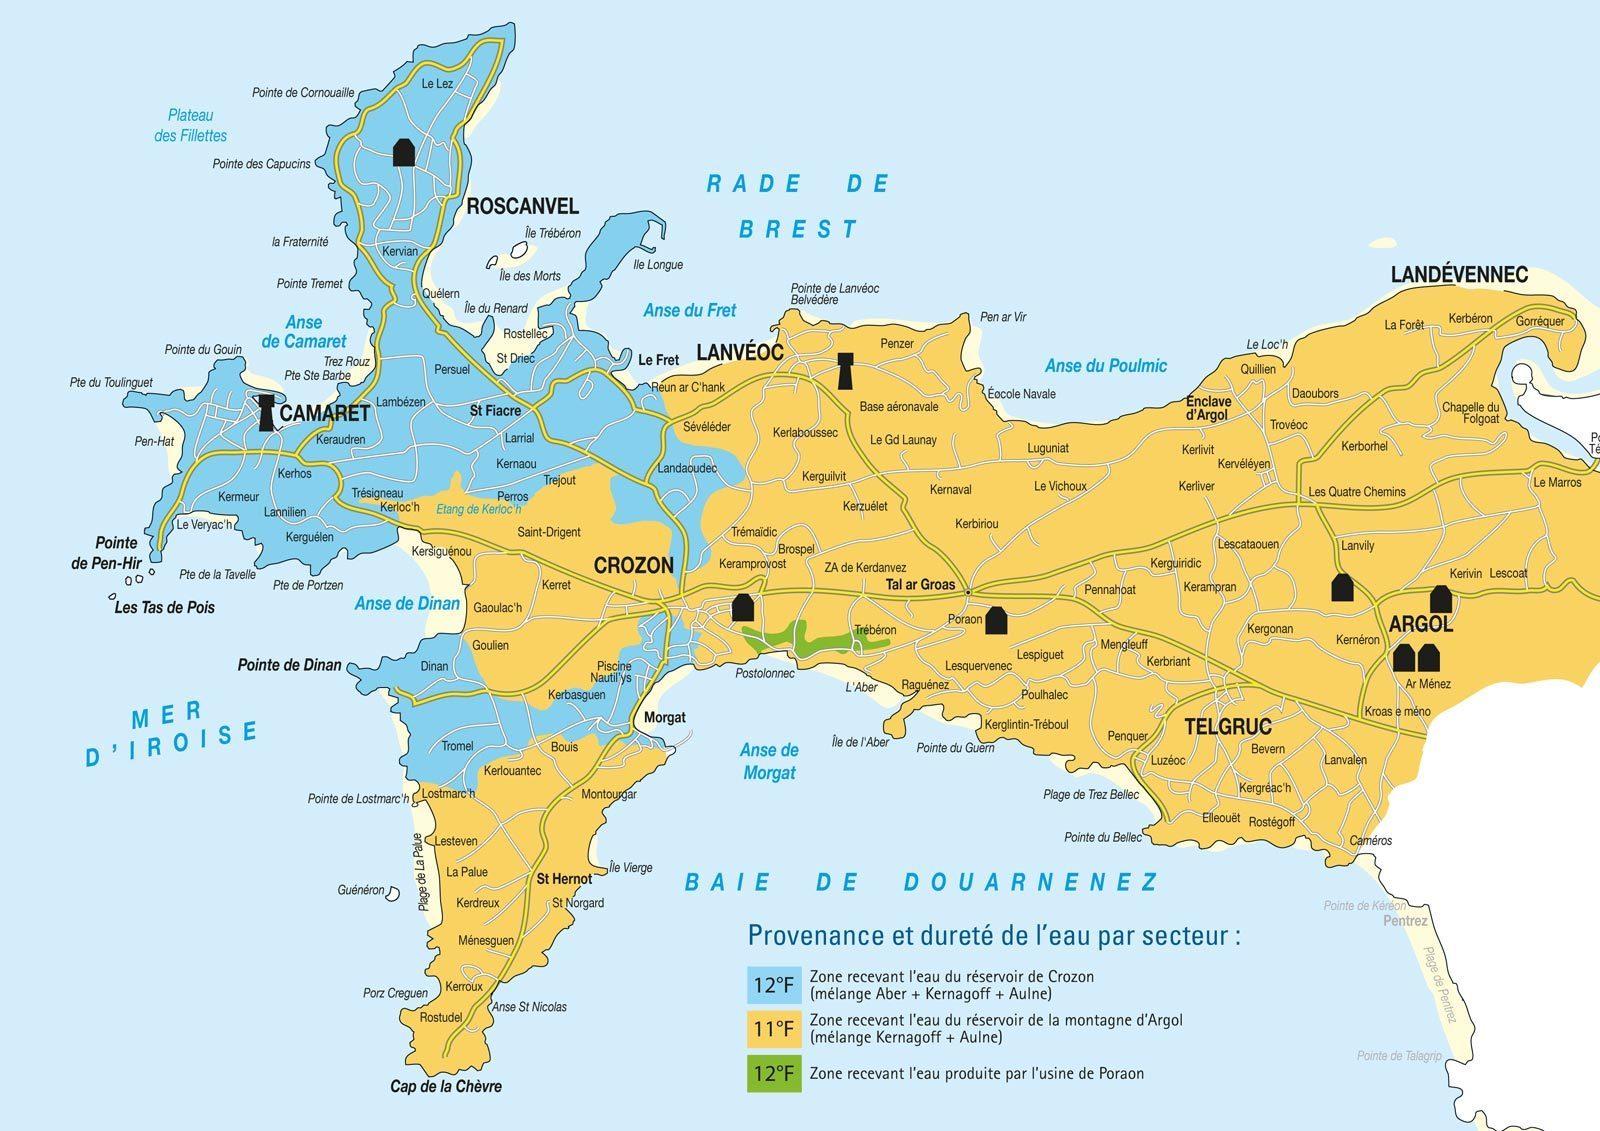 Carte Bretagne Presquile De Crozon.Qualite De L Eau Du Robinet Com Com Crozon